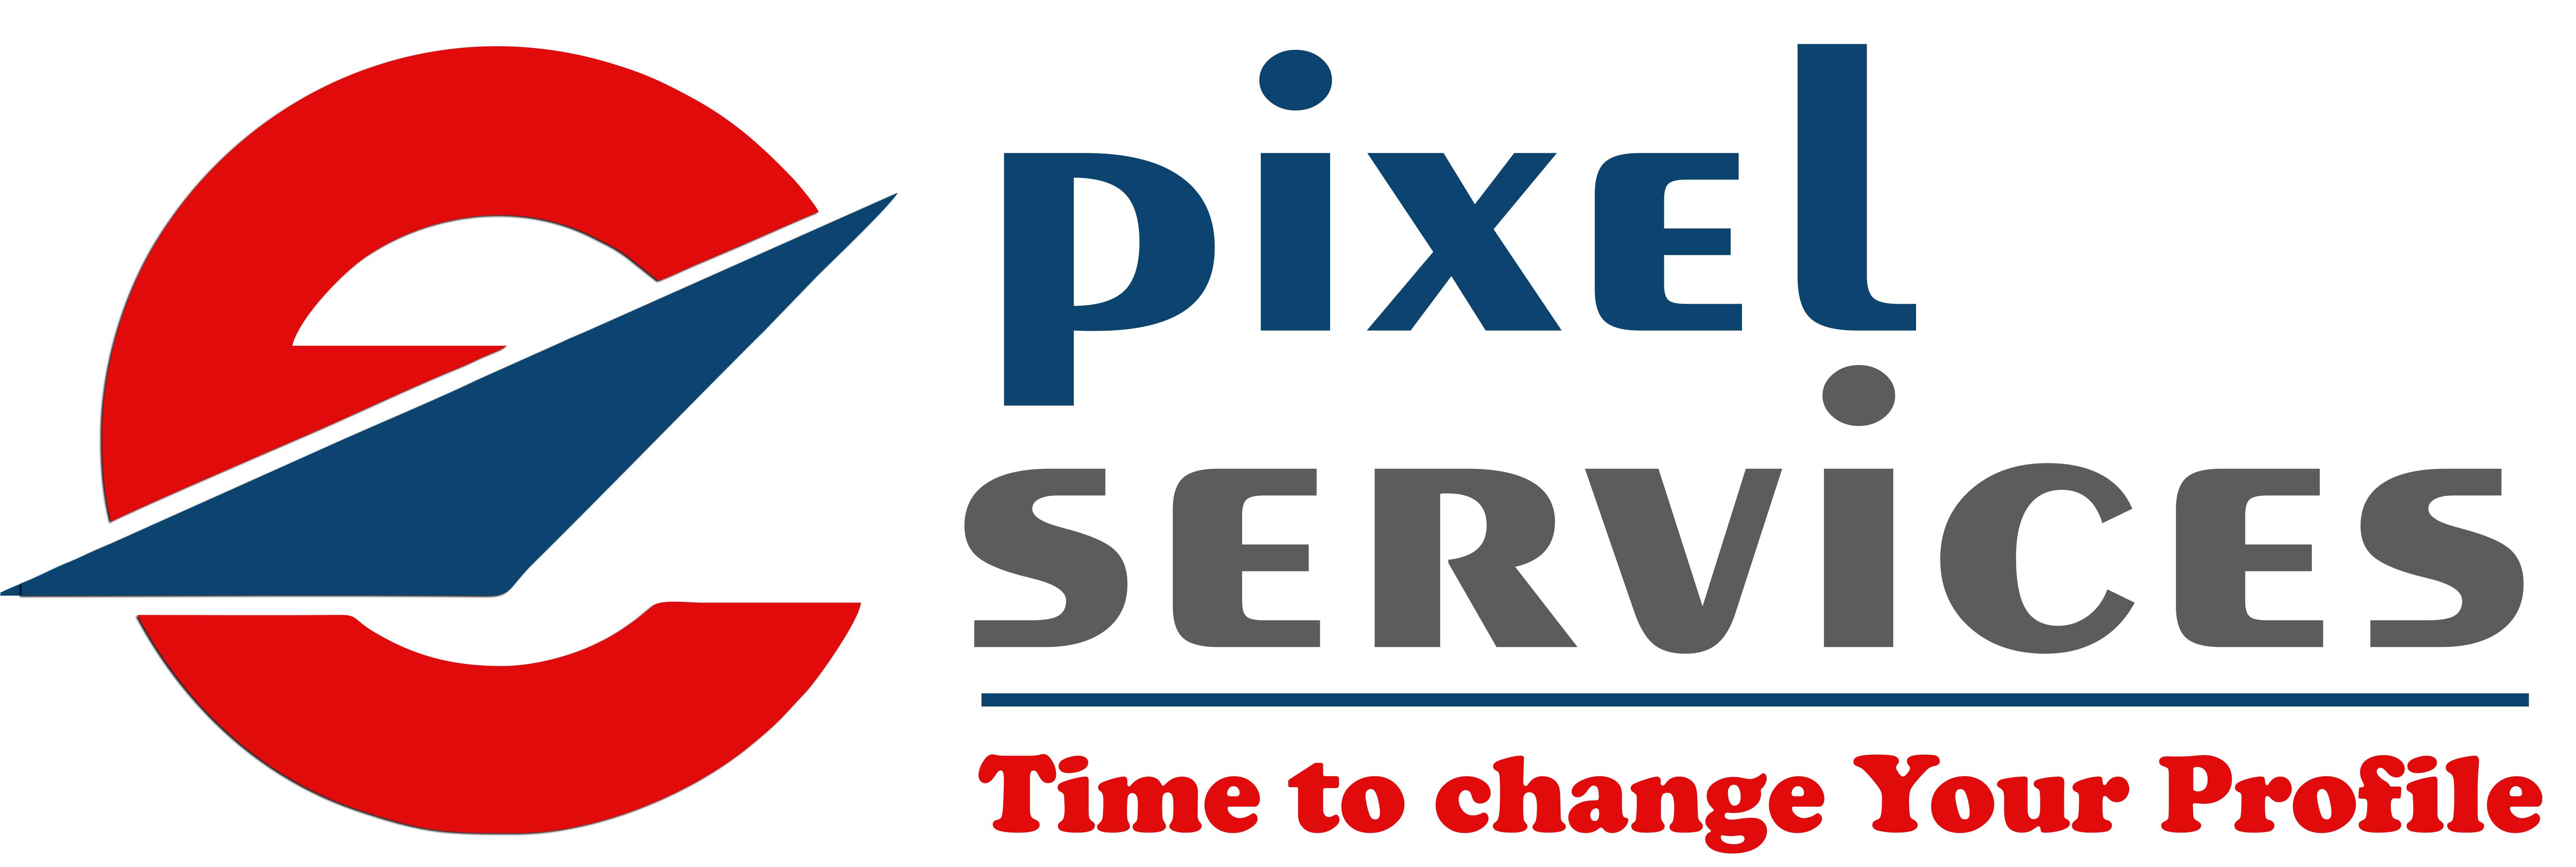 E Pixel Services Logo